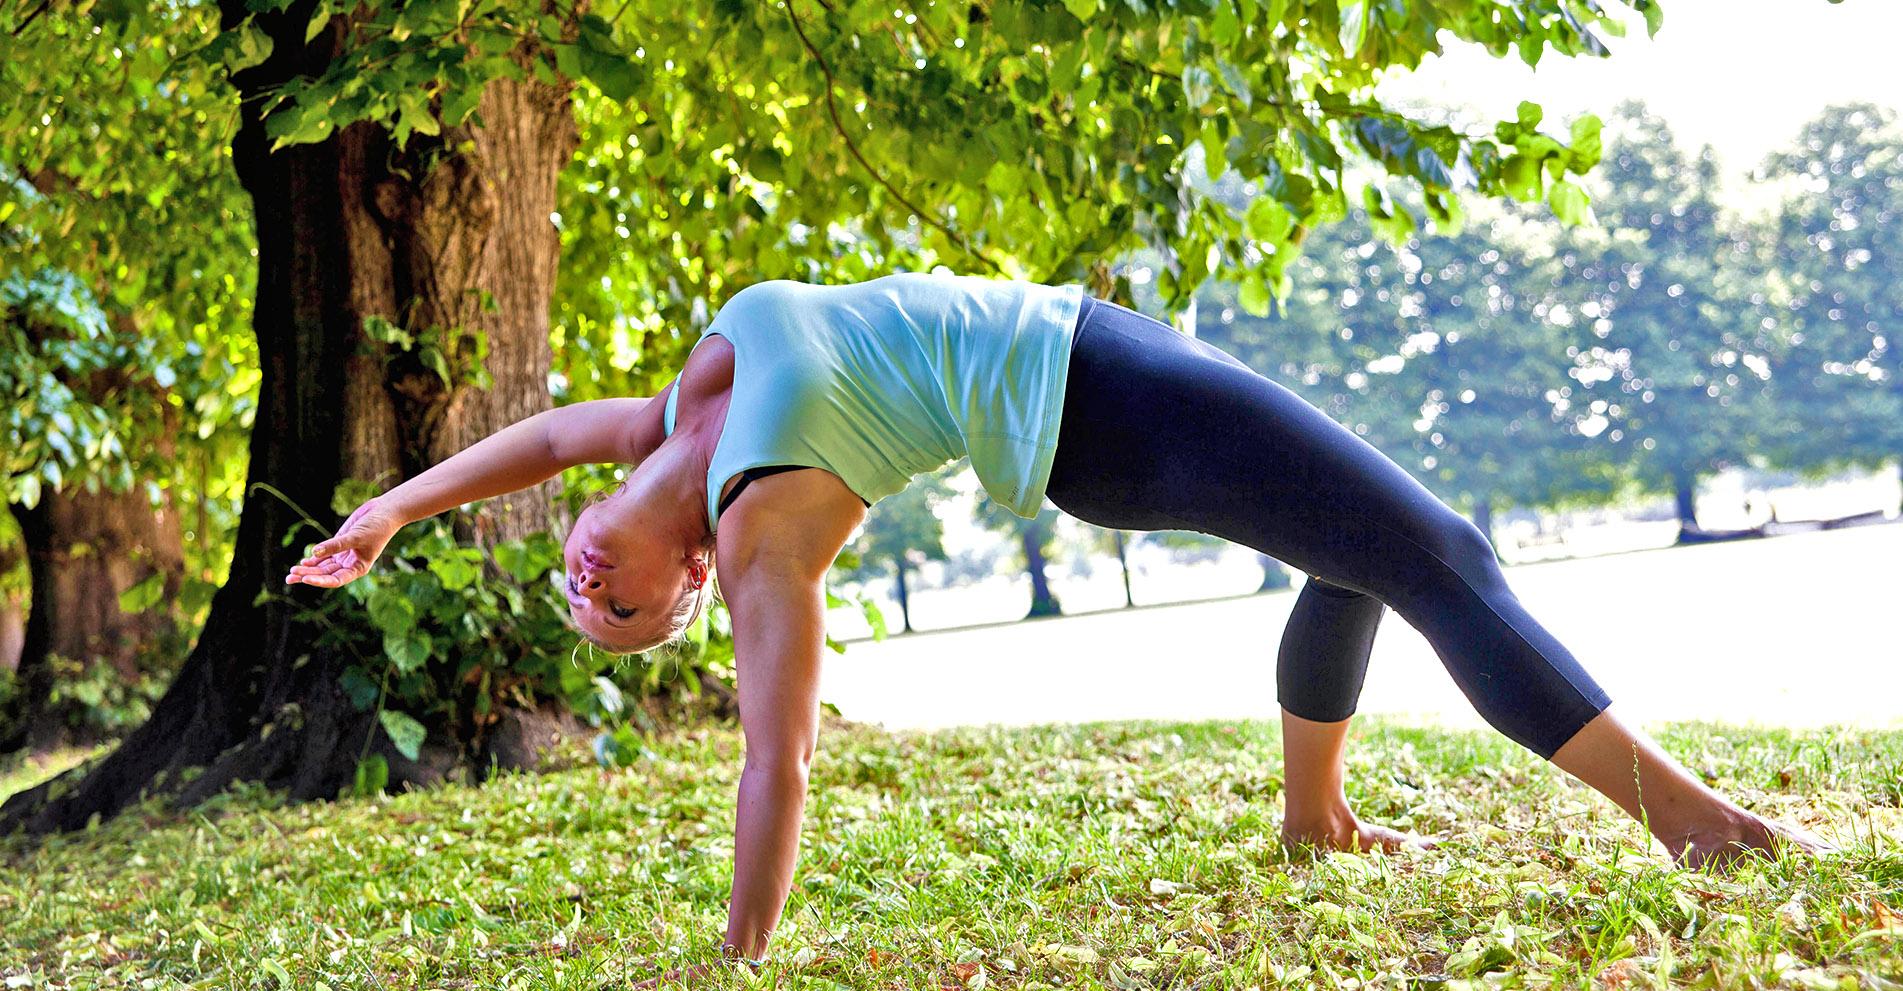 Lucia Yoga Pose 2 - Lucia Hoxha   Yoga   Lifestyle Coach   Online Yoga for Women